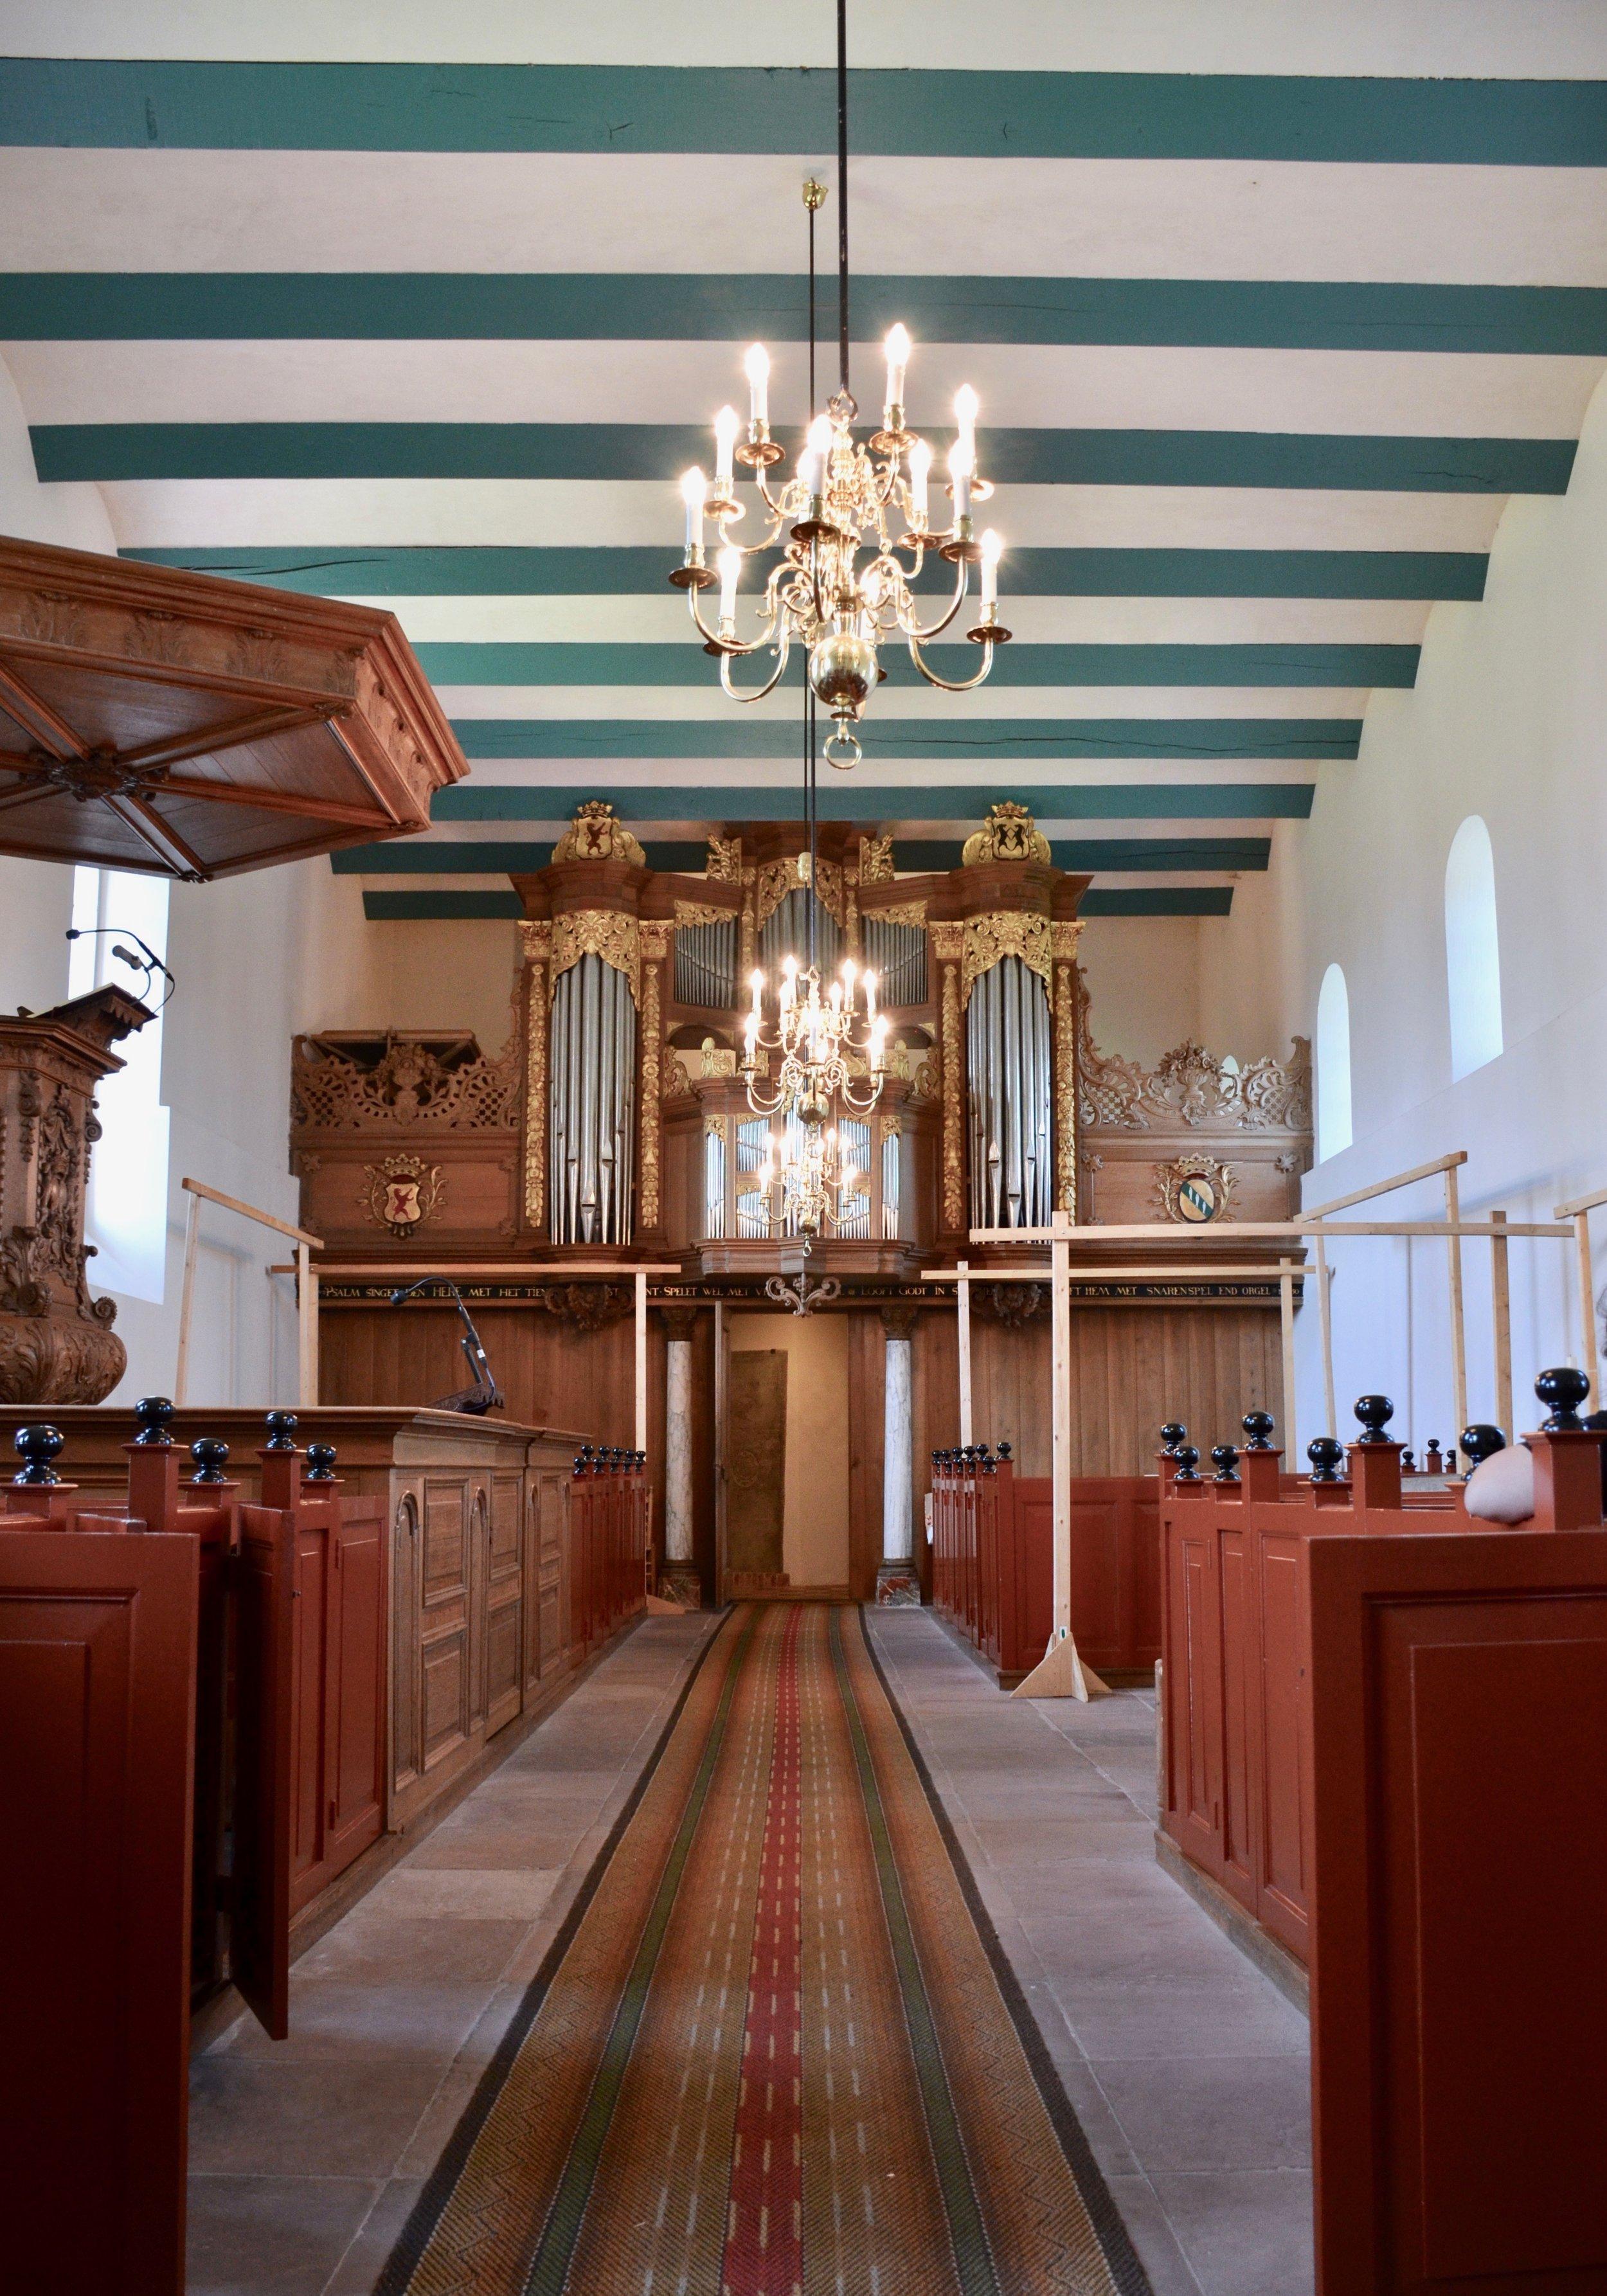 1667 organ in Kantens, Holland.